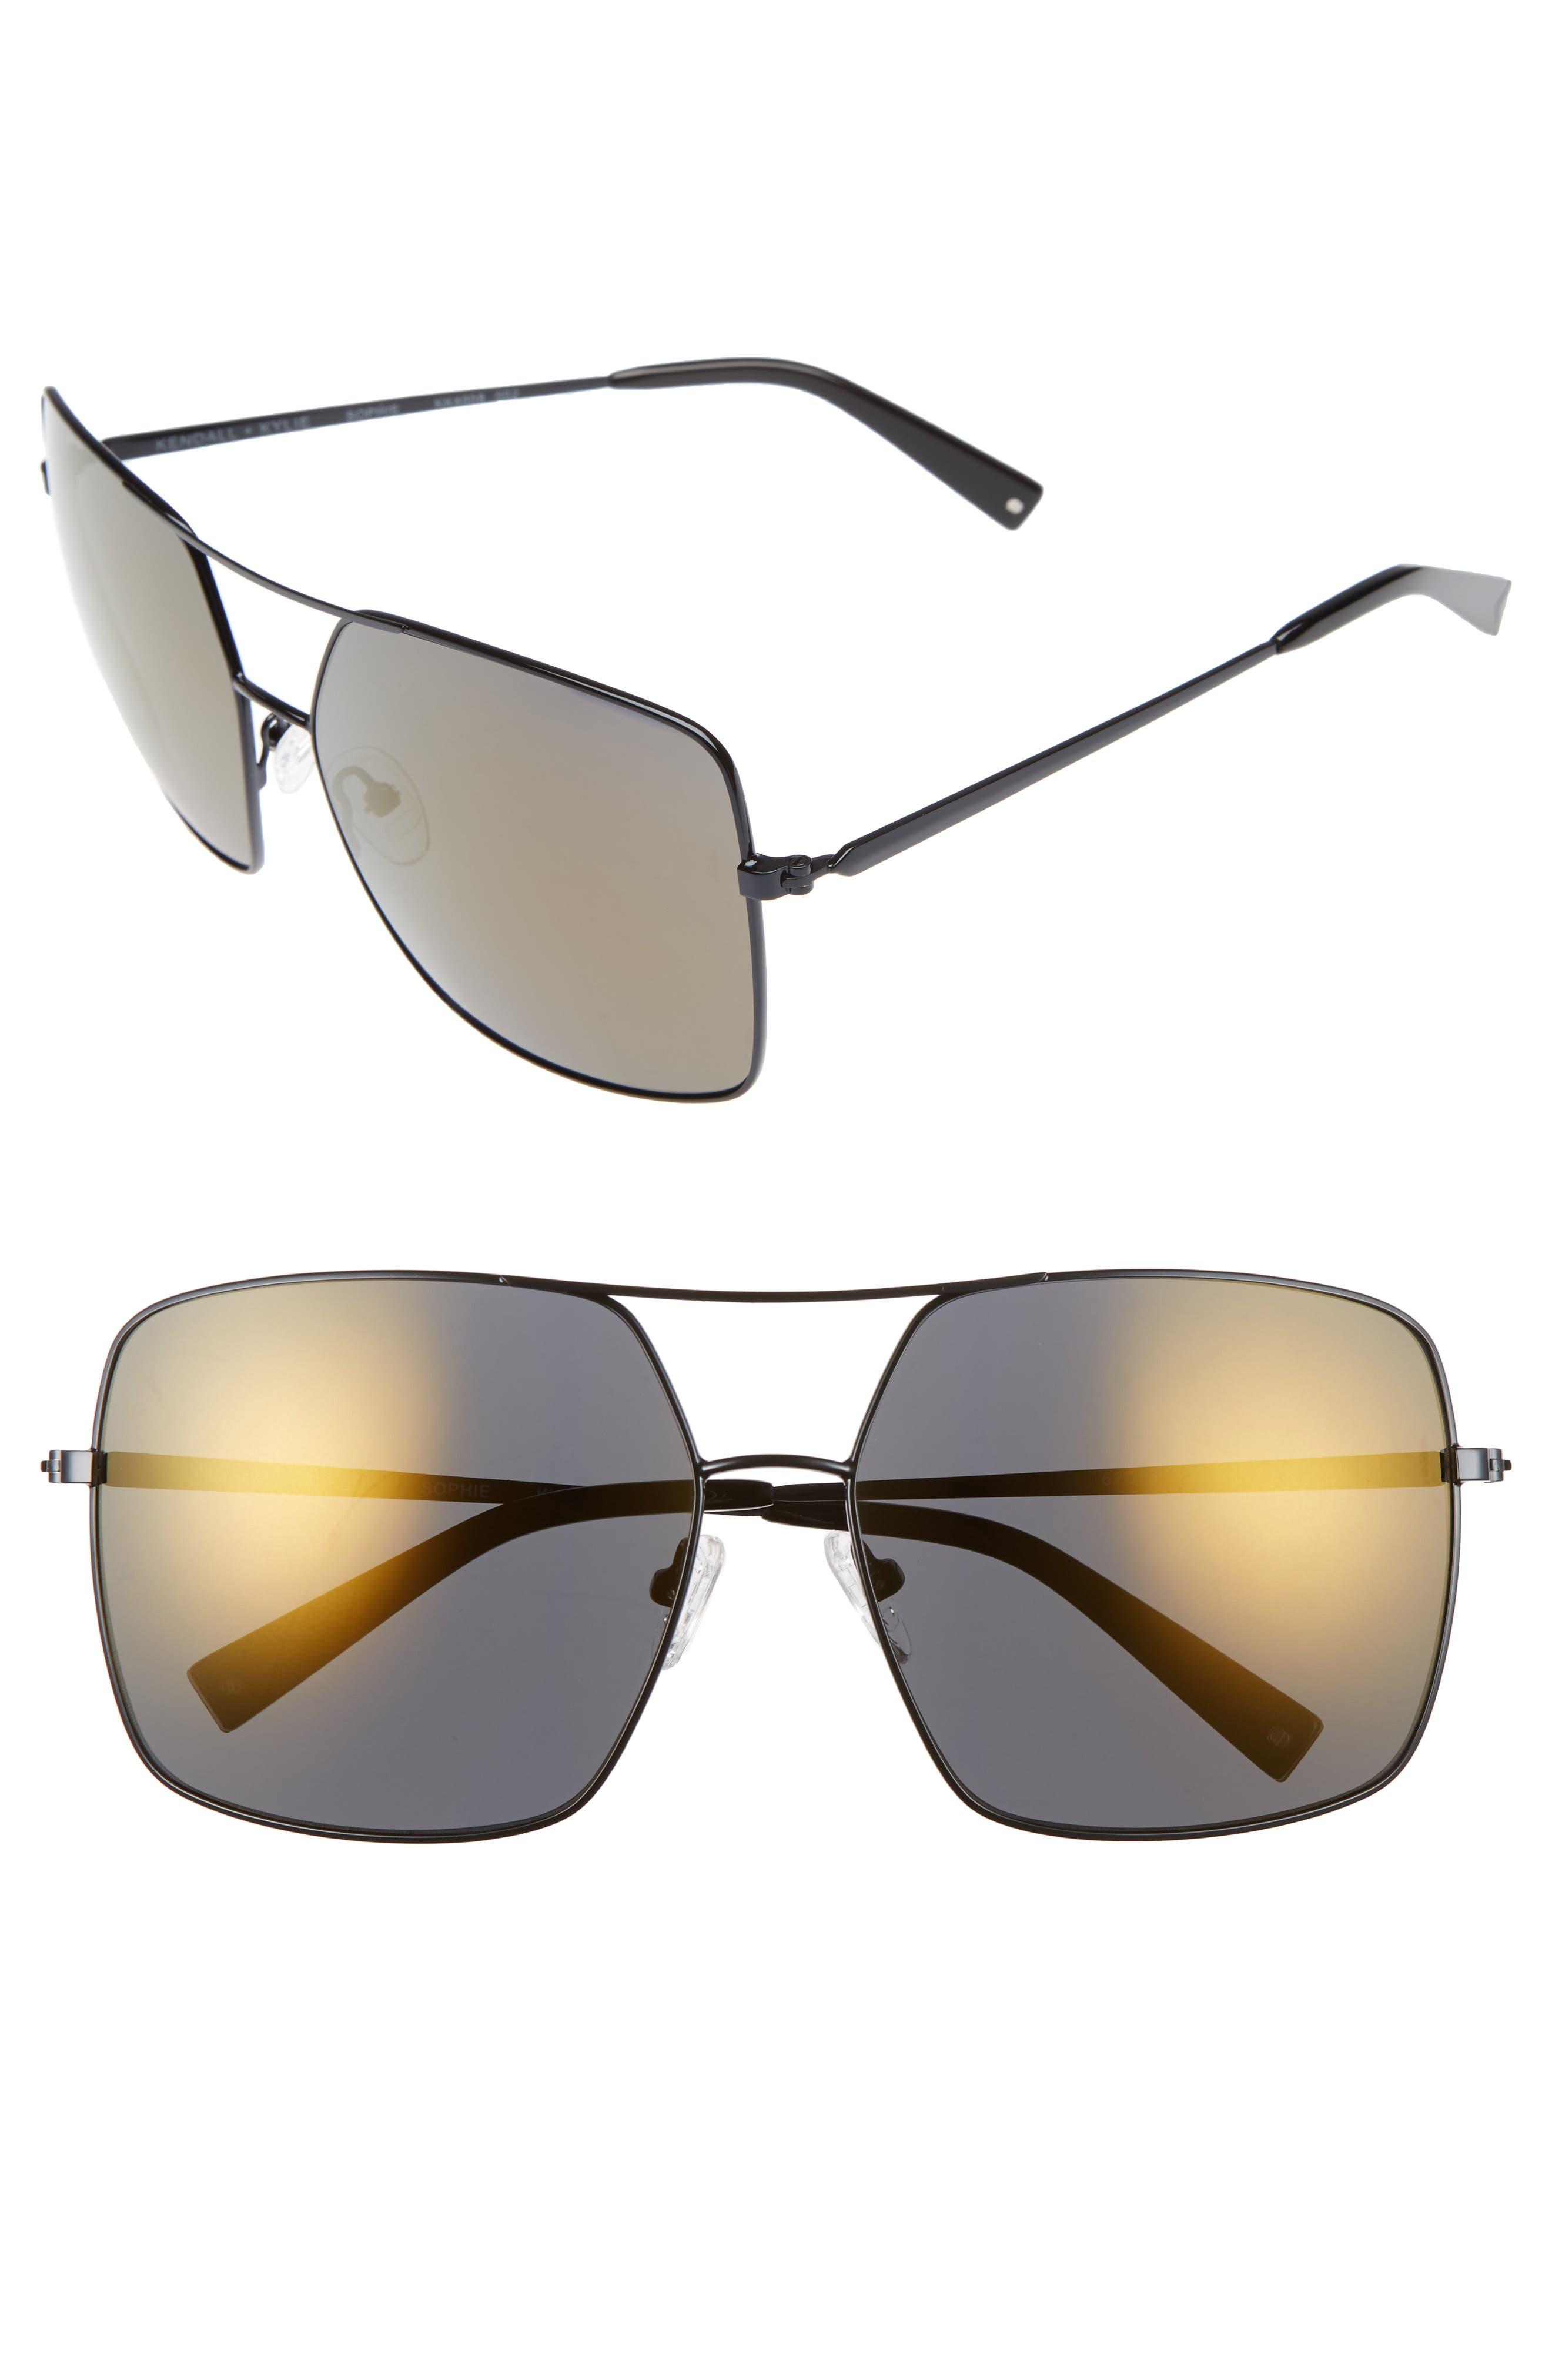 65mm Navigator Sunglasses,                         Main,                         color, 001